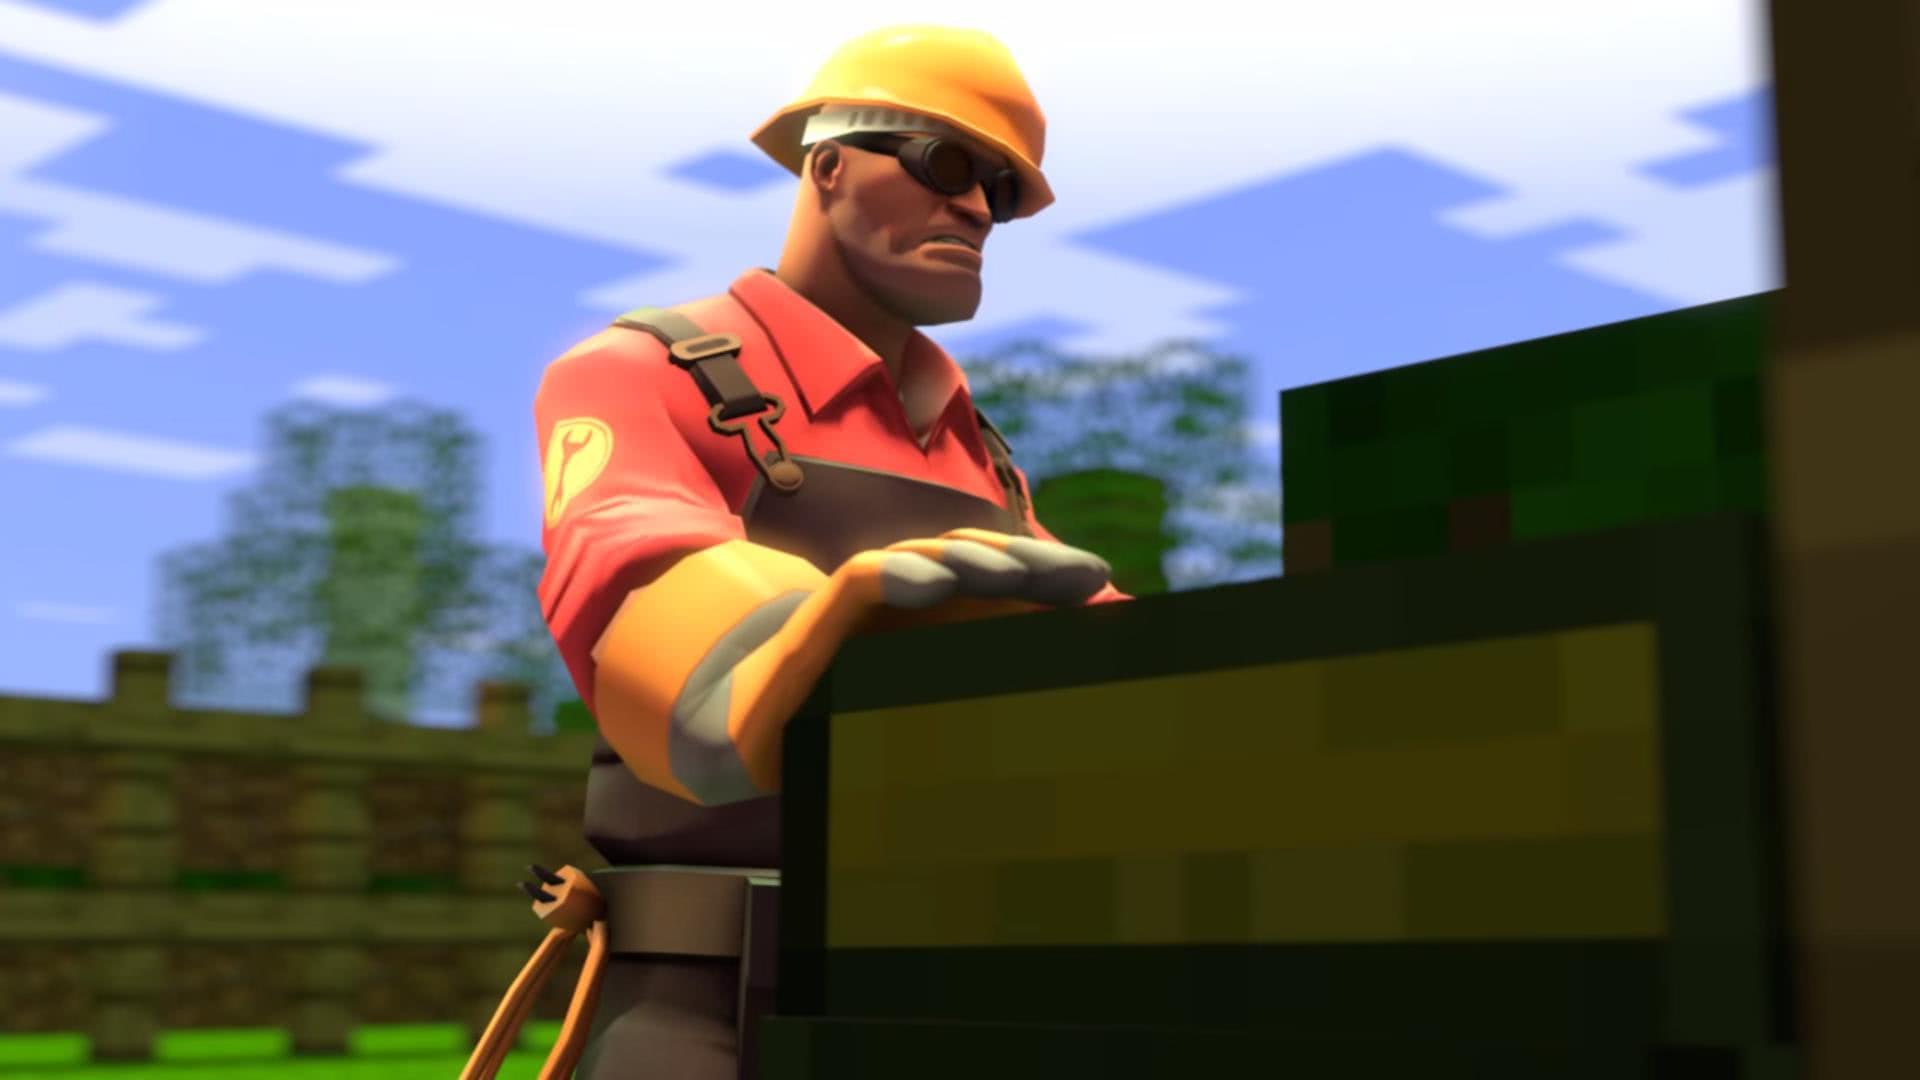 [Video] Engineer in minecraft - или сказка о том, как инженер в кубач попал